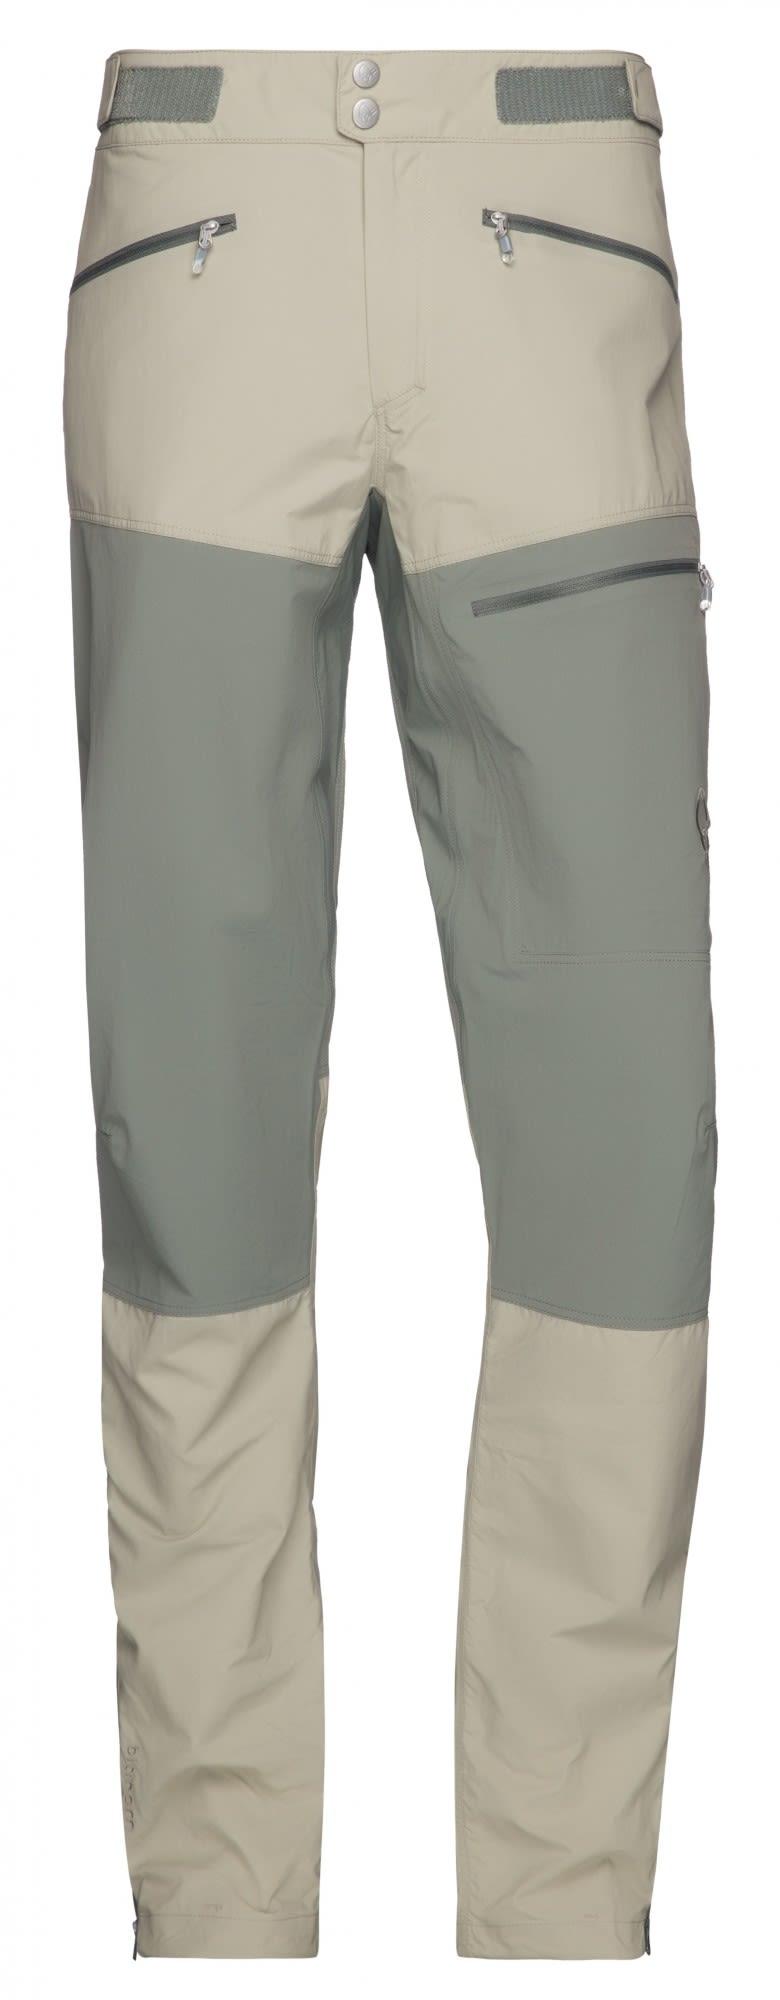 Norrona Bitihorn Lightweight Pants Braun, Male Mens -Farbe Sandstone, M